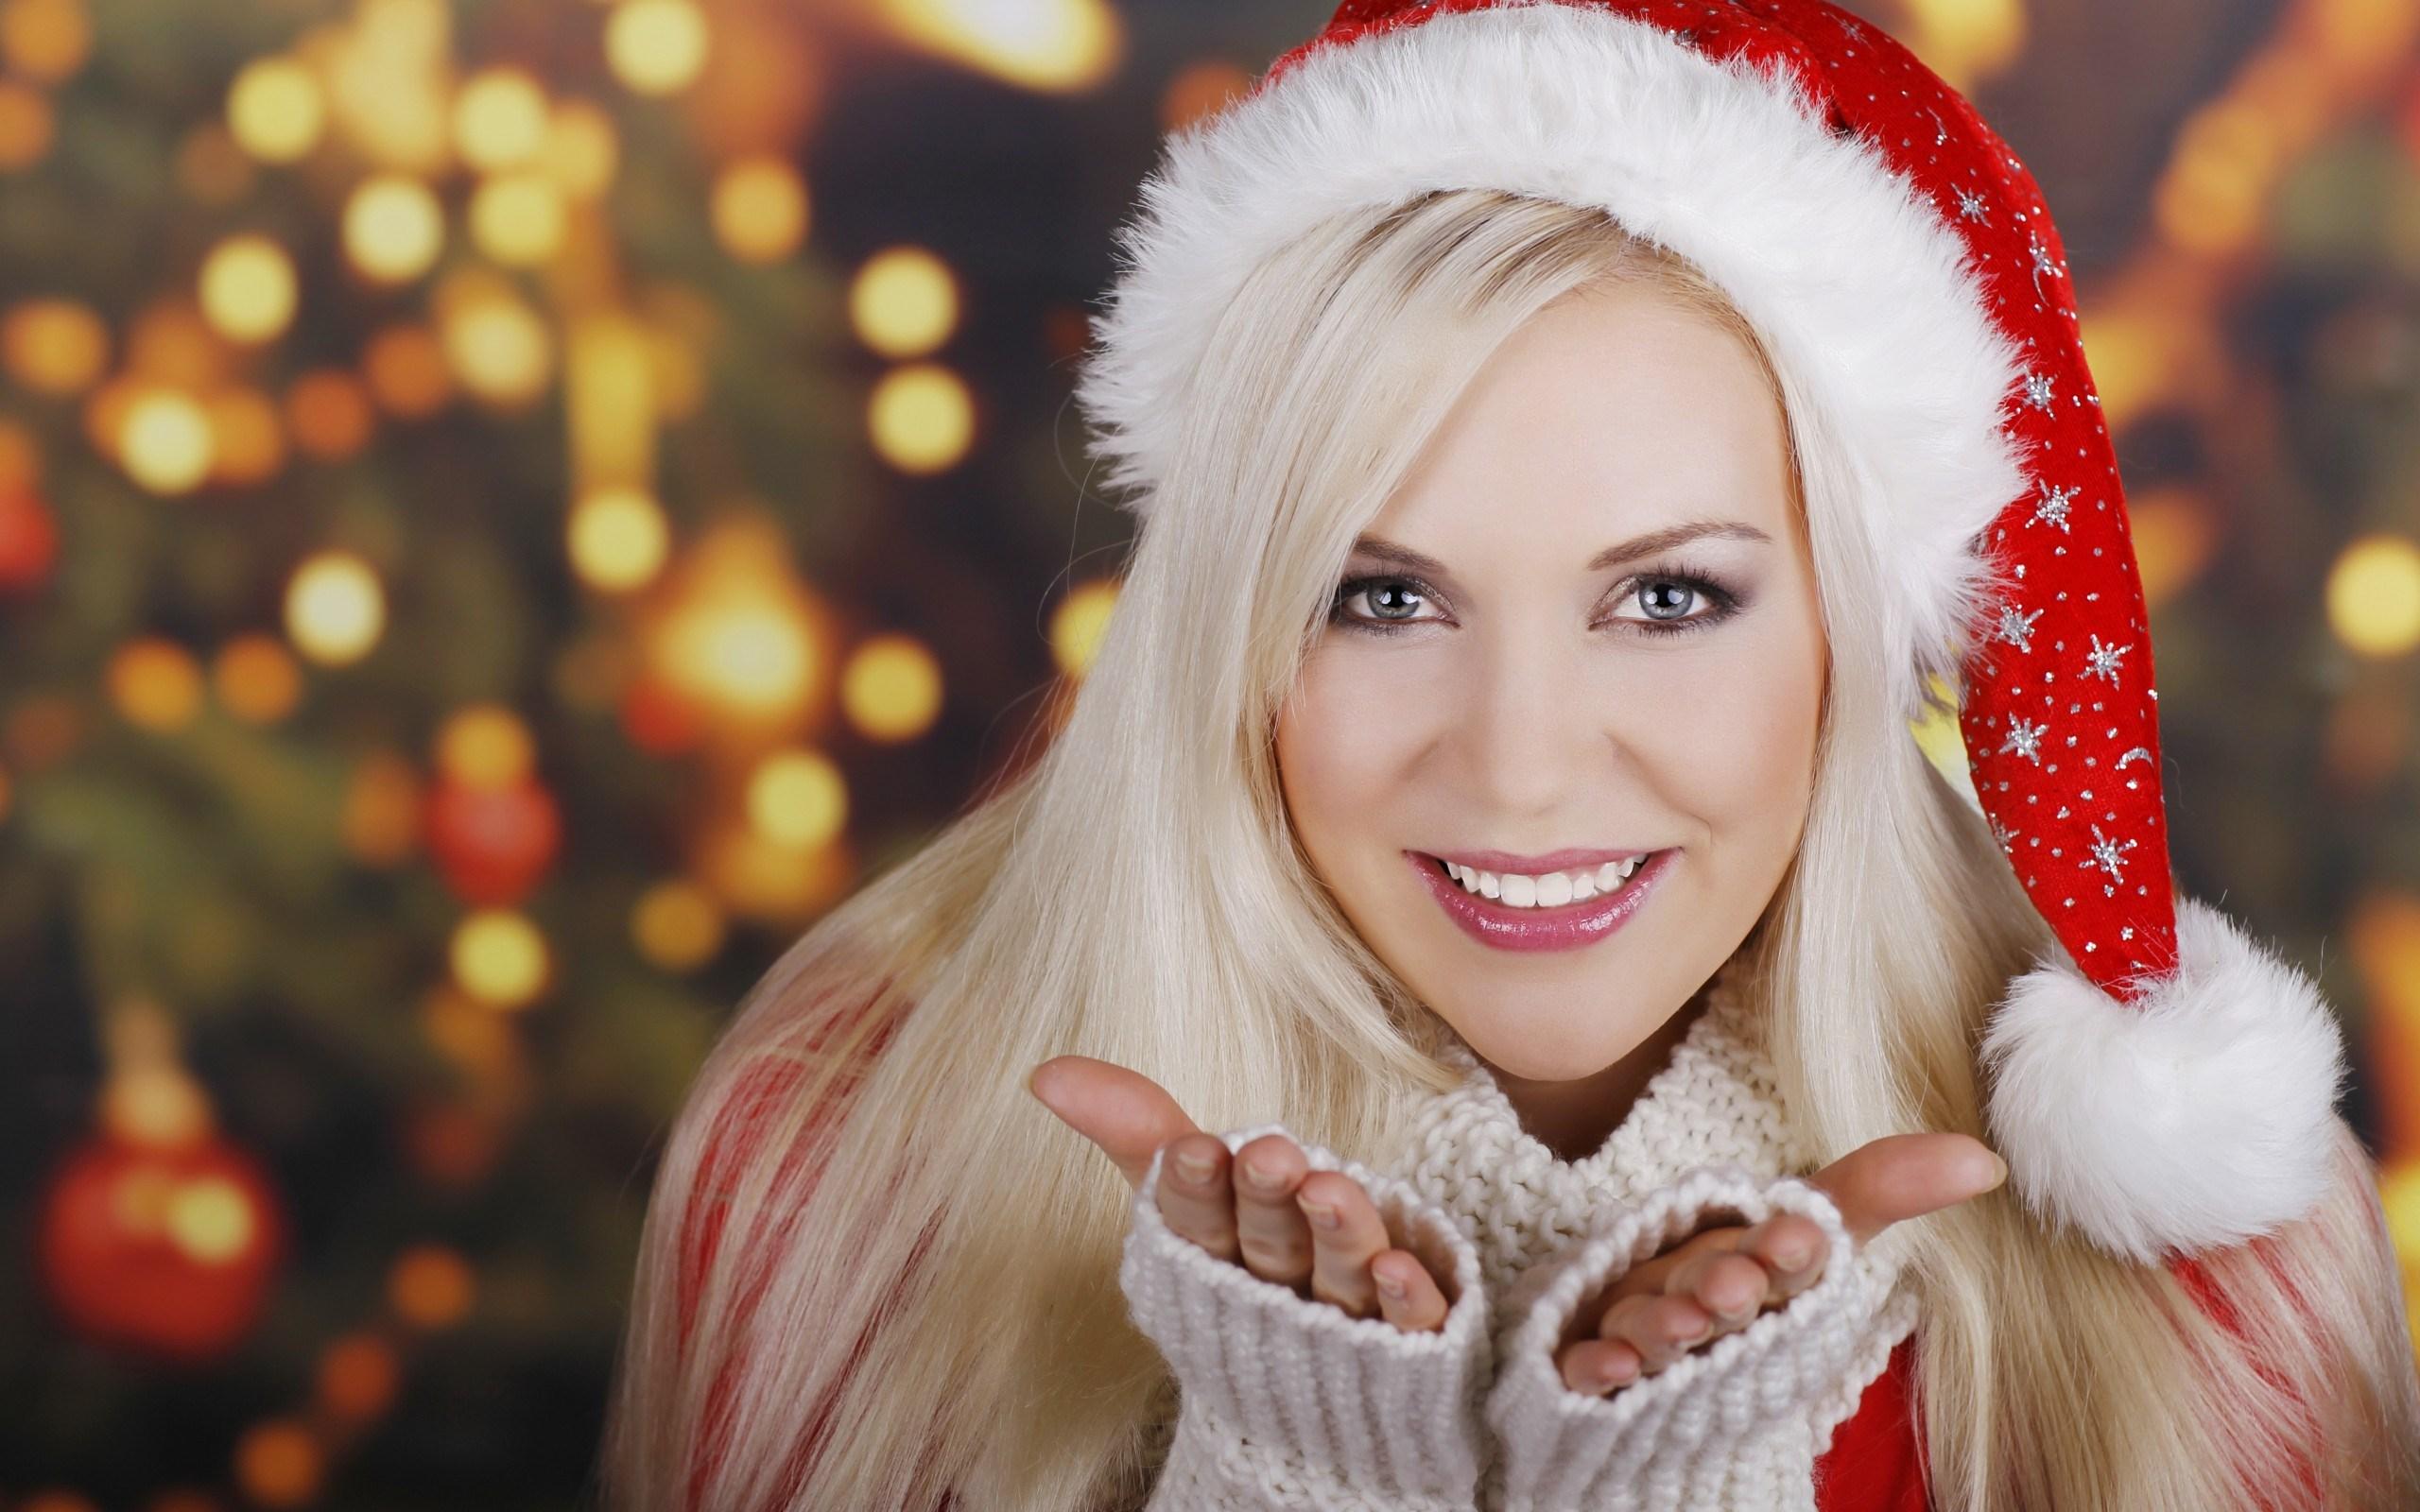 Girl Blonde Smile Christmas Tree New Year